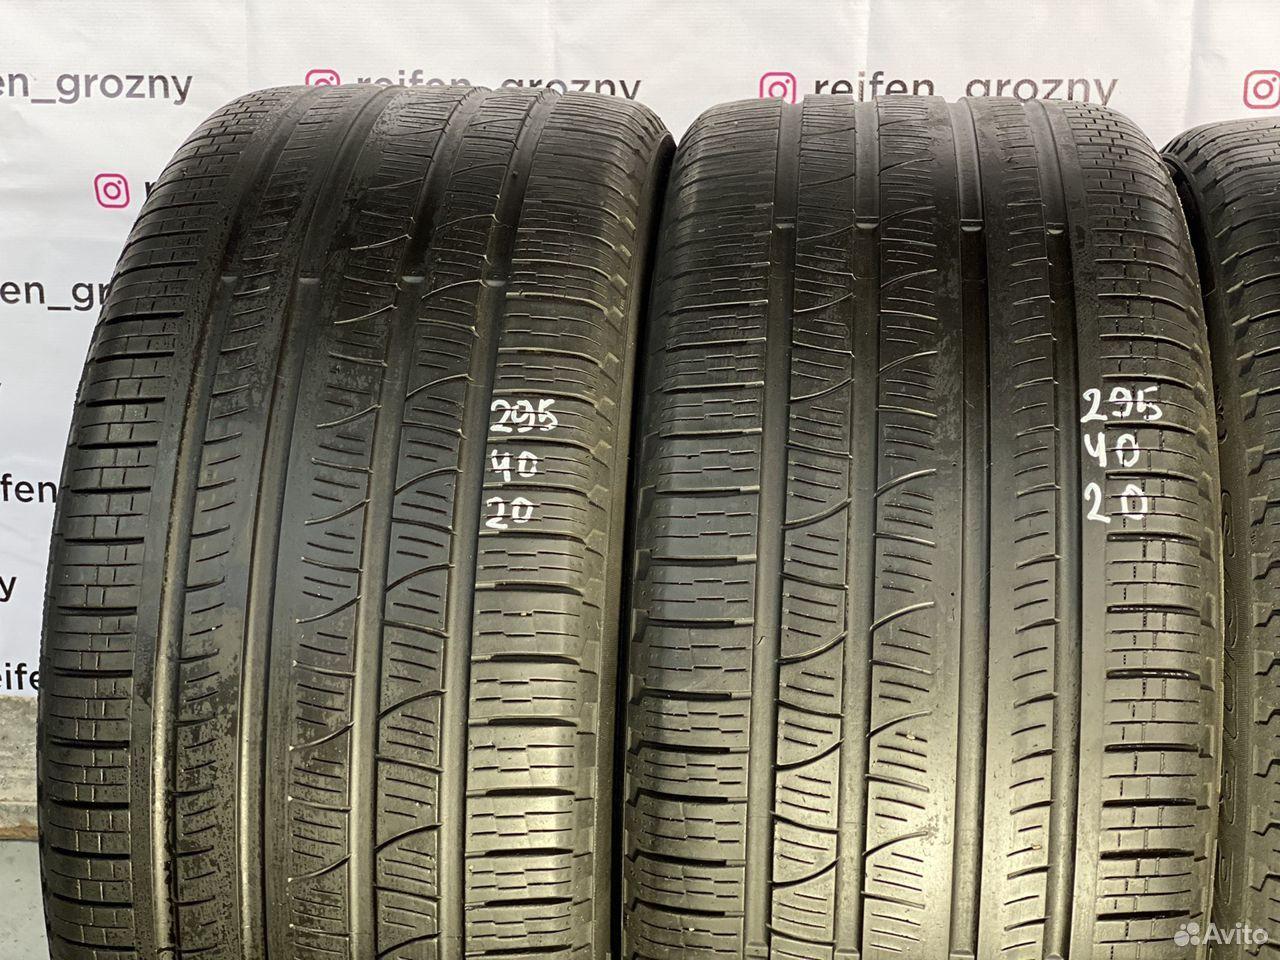 295/40/20 Pirelli Scorpion Verde - 3 шт 89380001718 купить 3